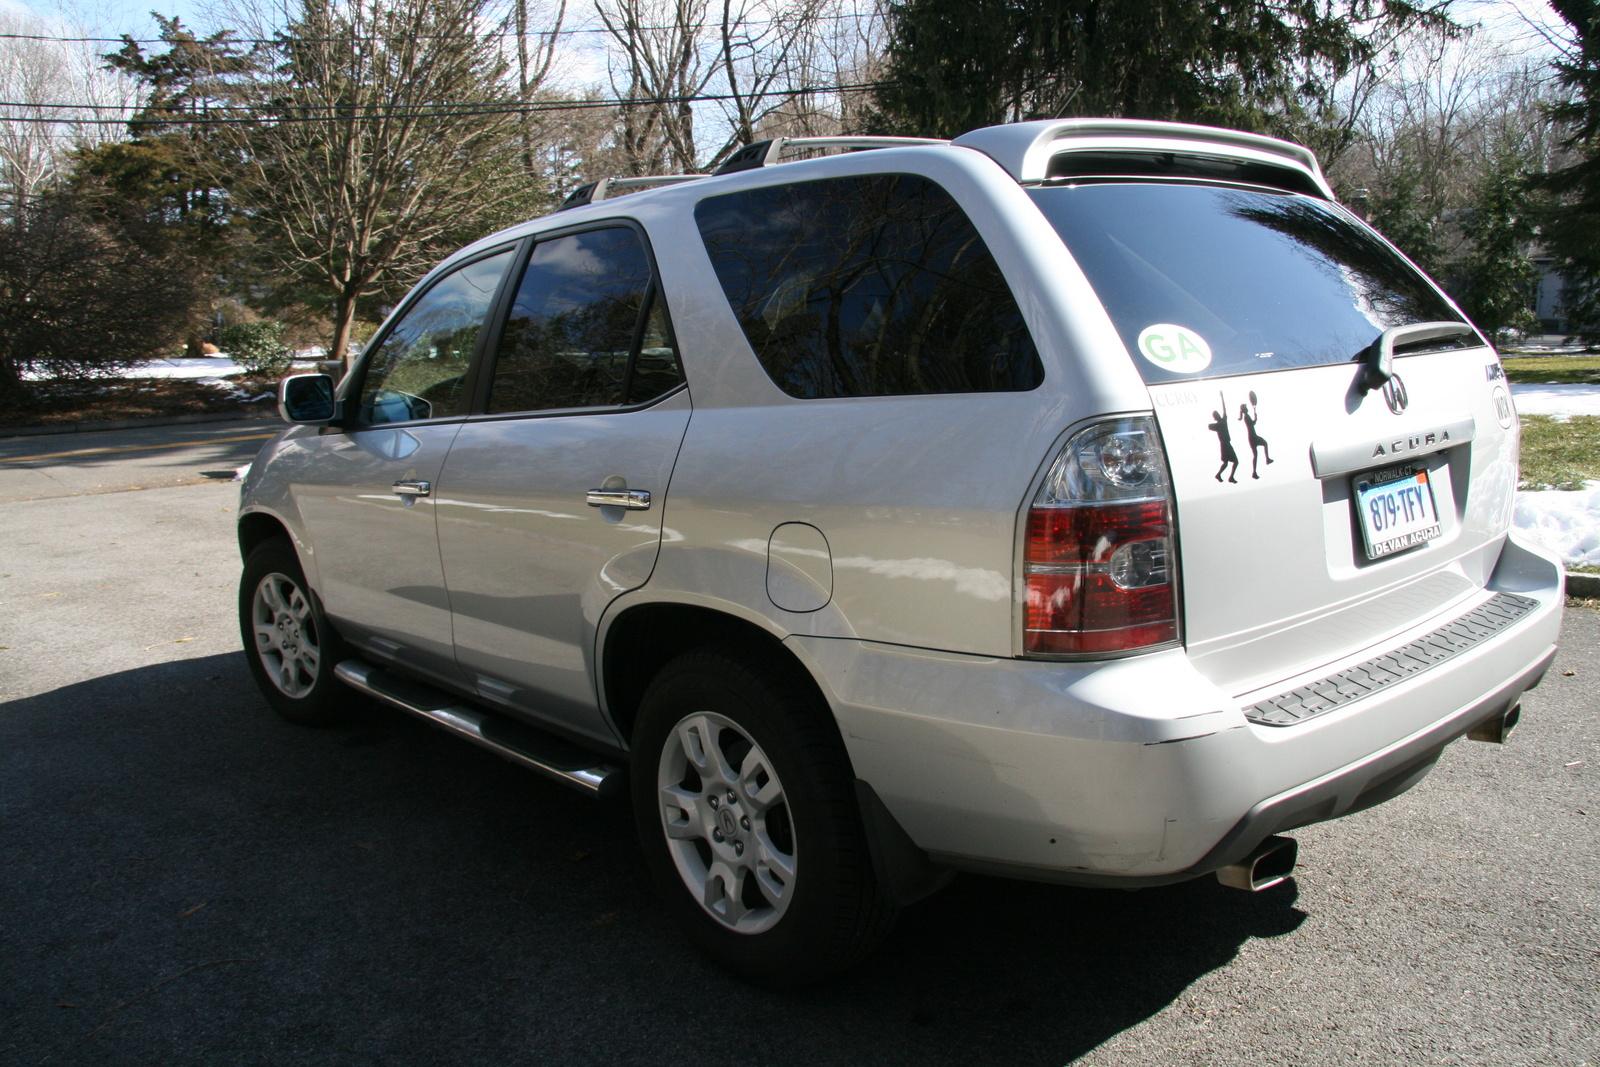 Acura Mdx Touring Pic on 2000 Acura Rl Temperature Sensor